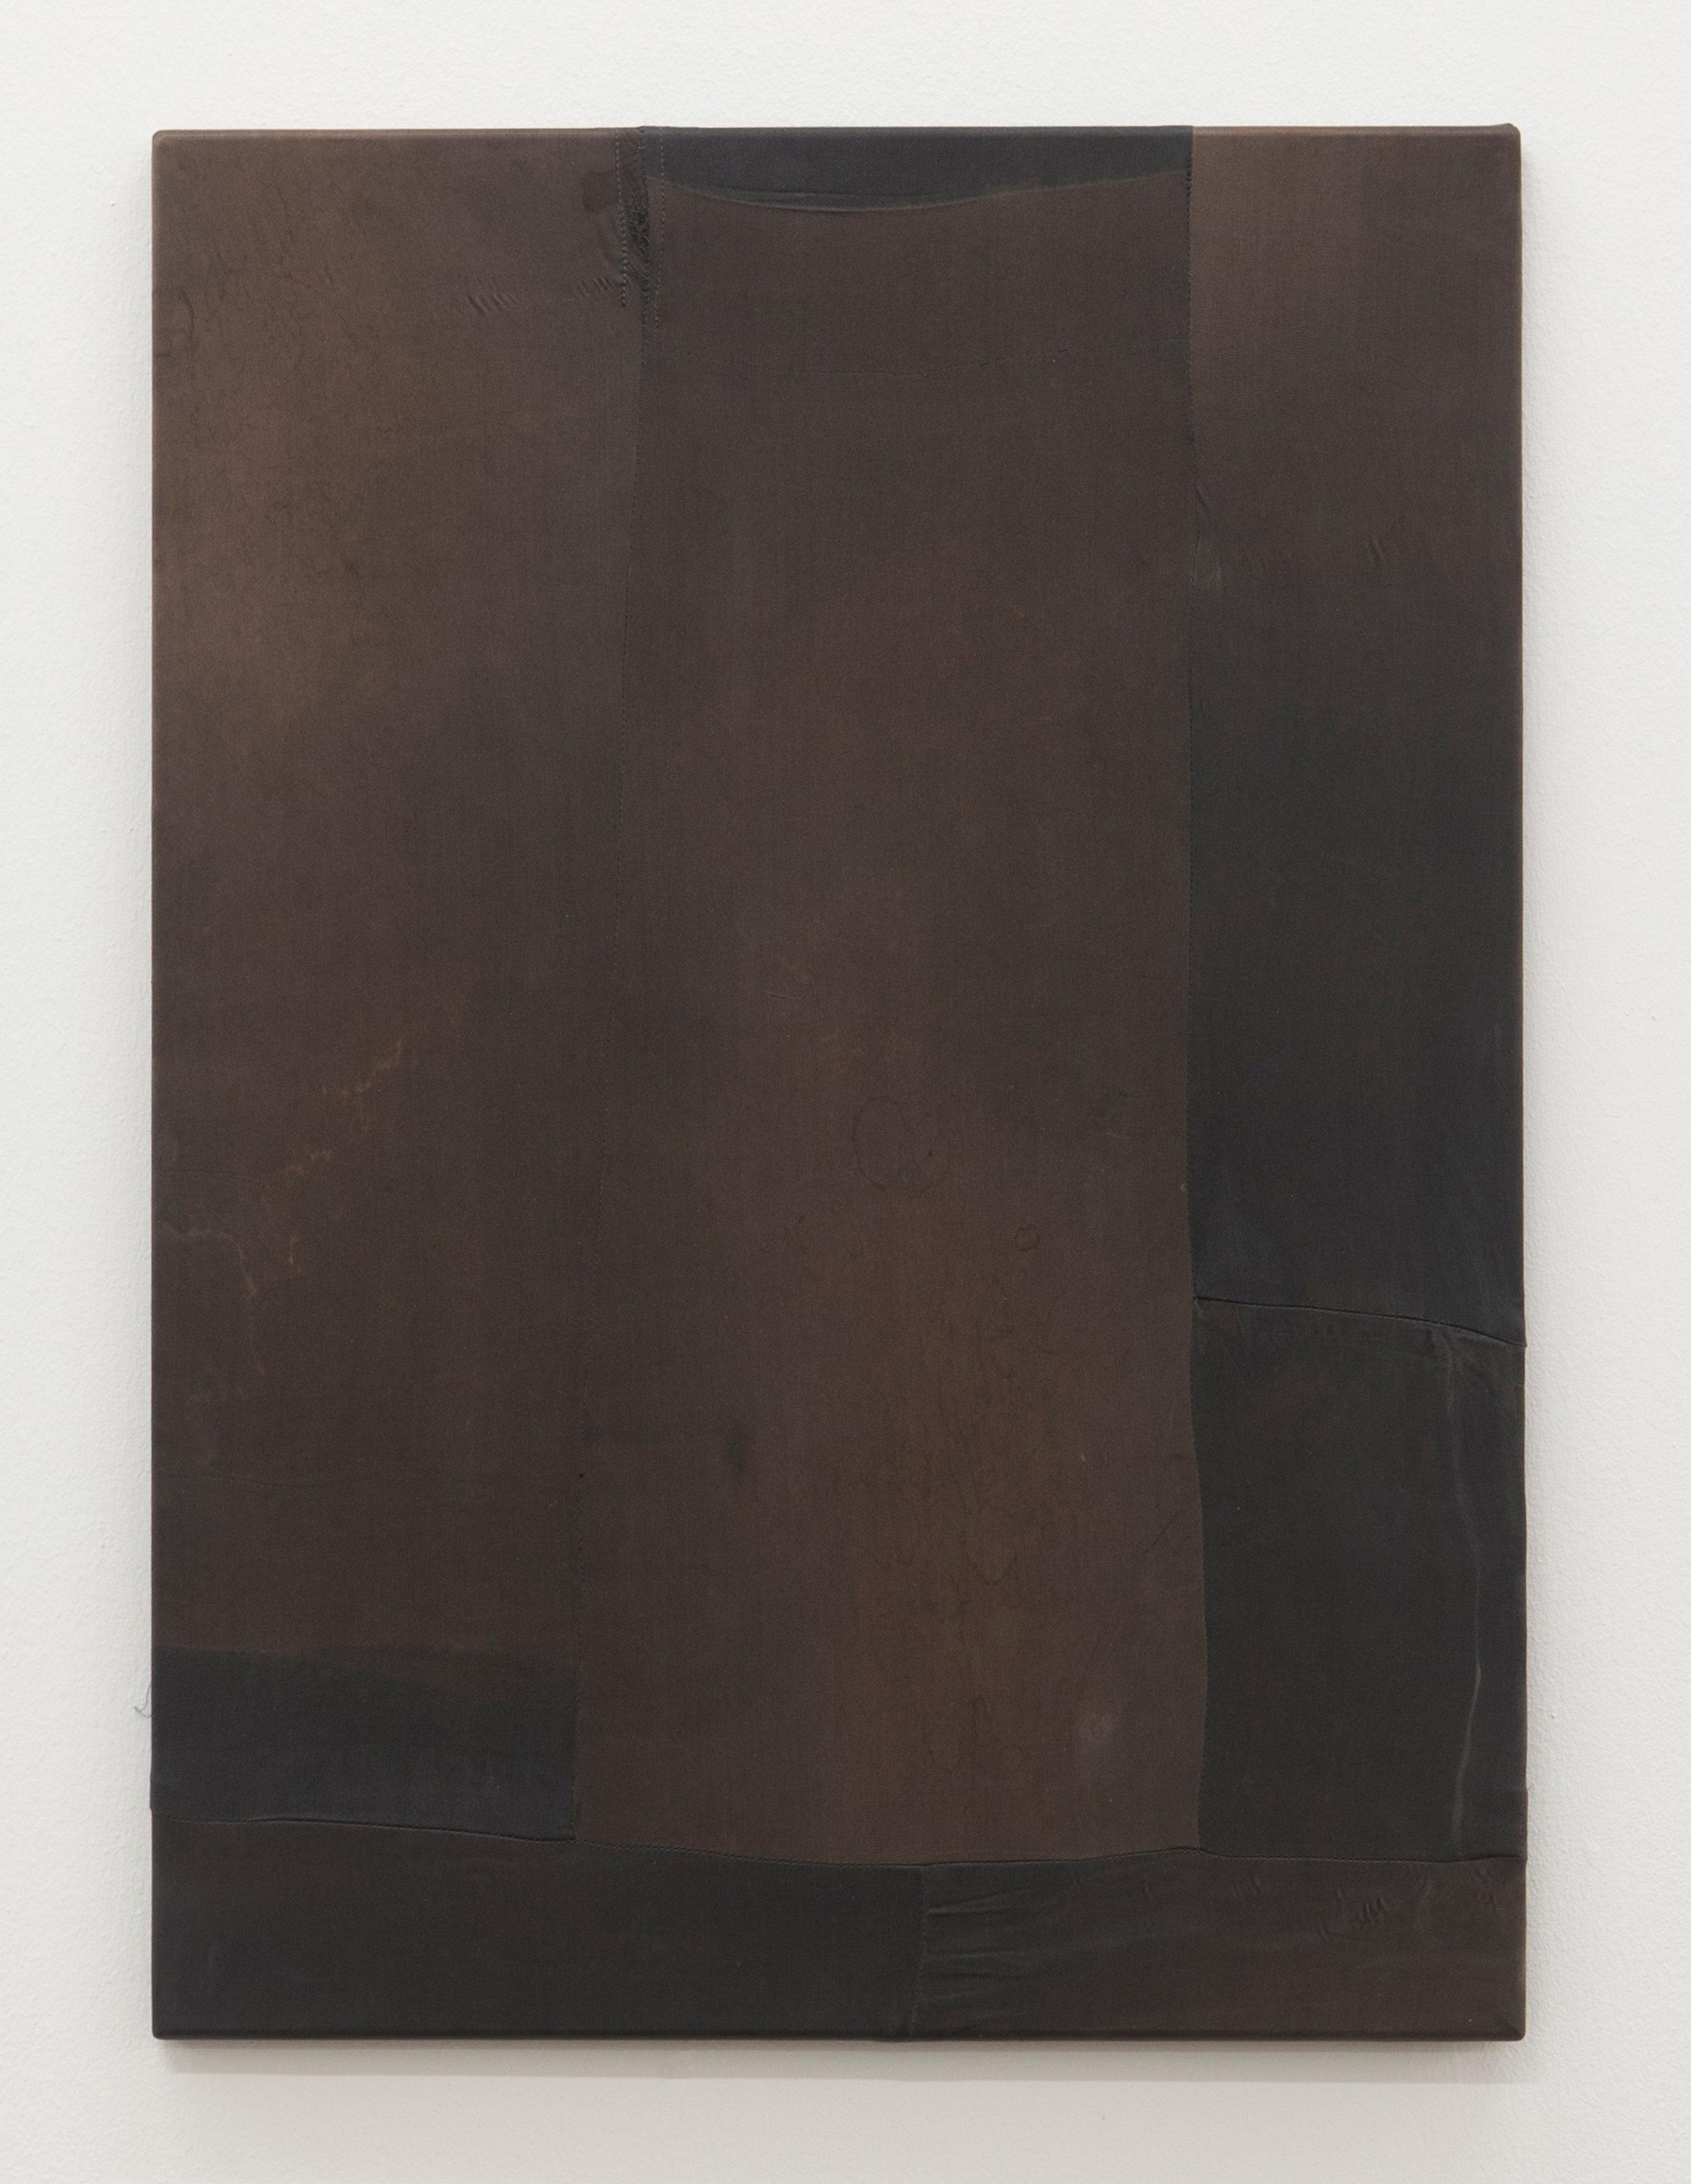 MTWTFSS12WEEKDAY (2012-2014) Artist's silk pants on stretcher (front) 88,5 x 72,5 cm